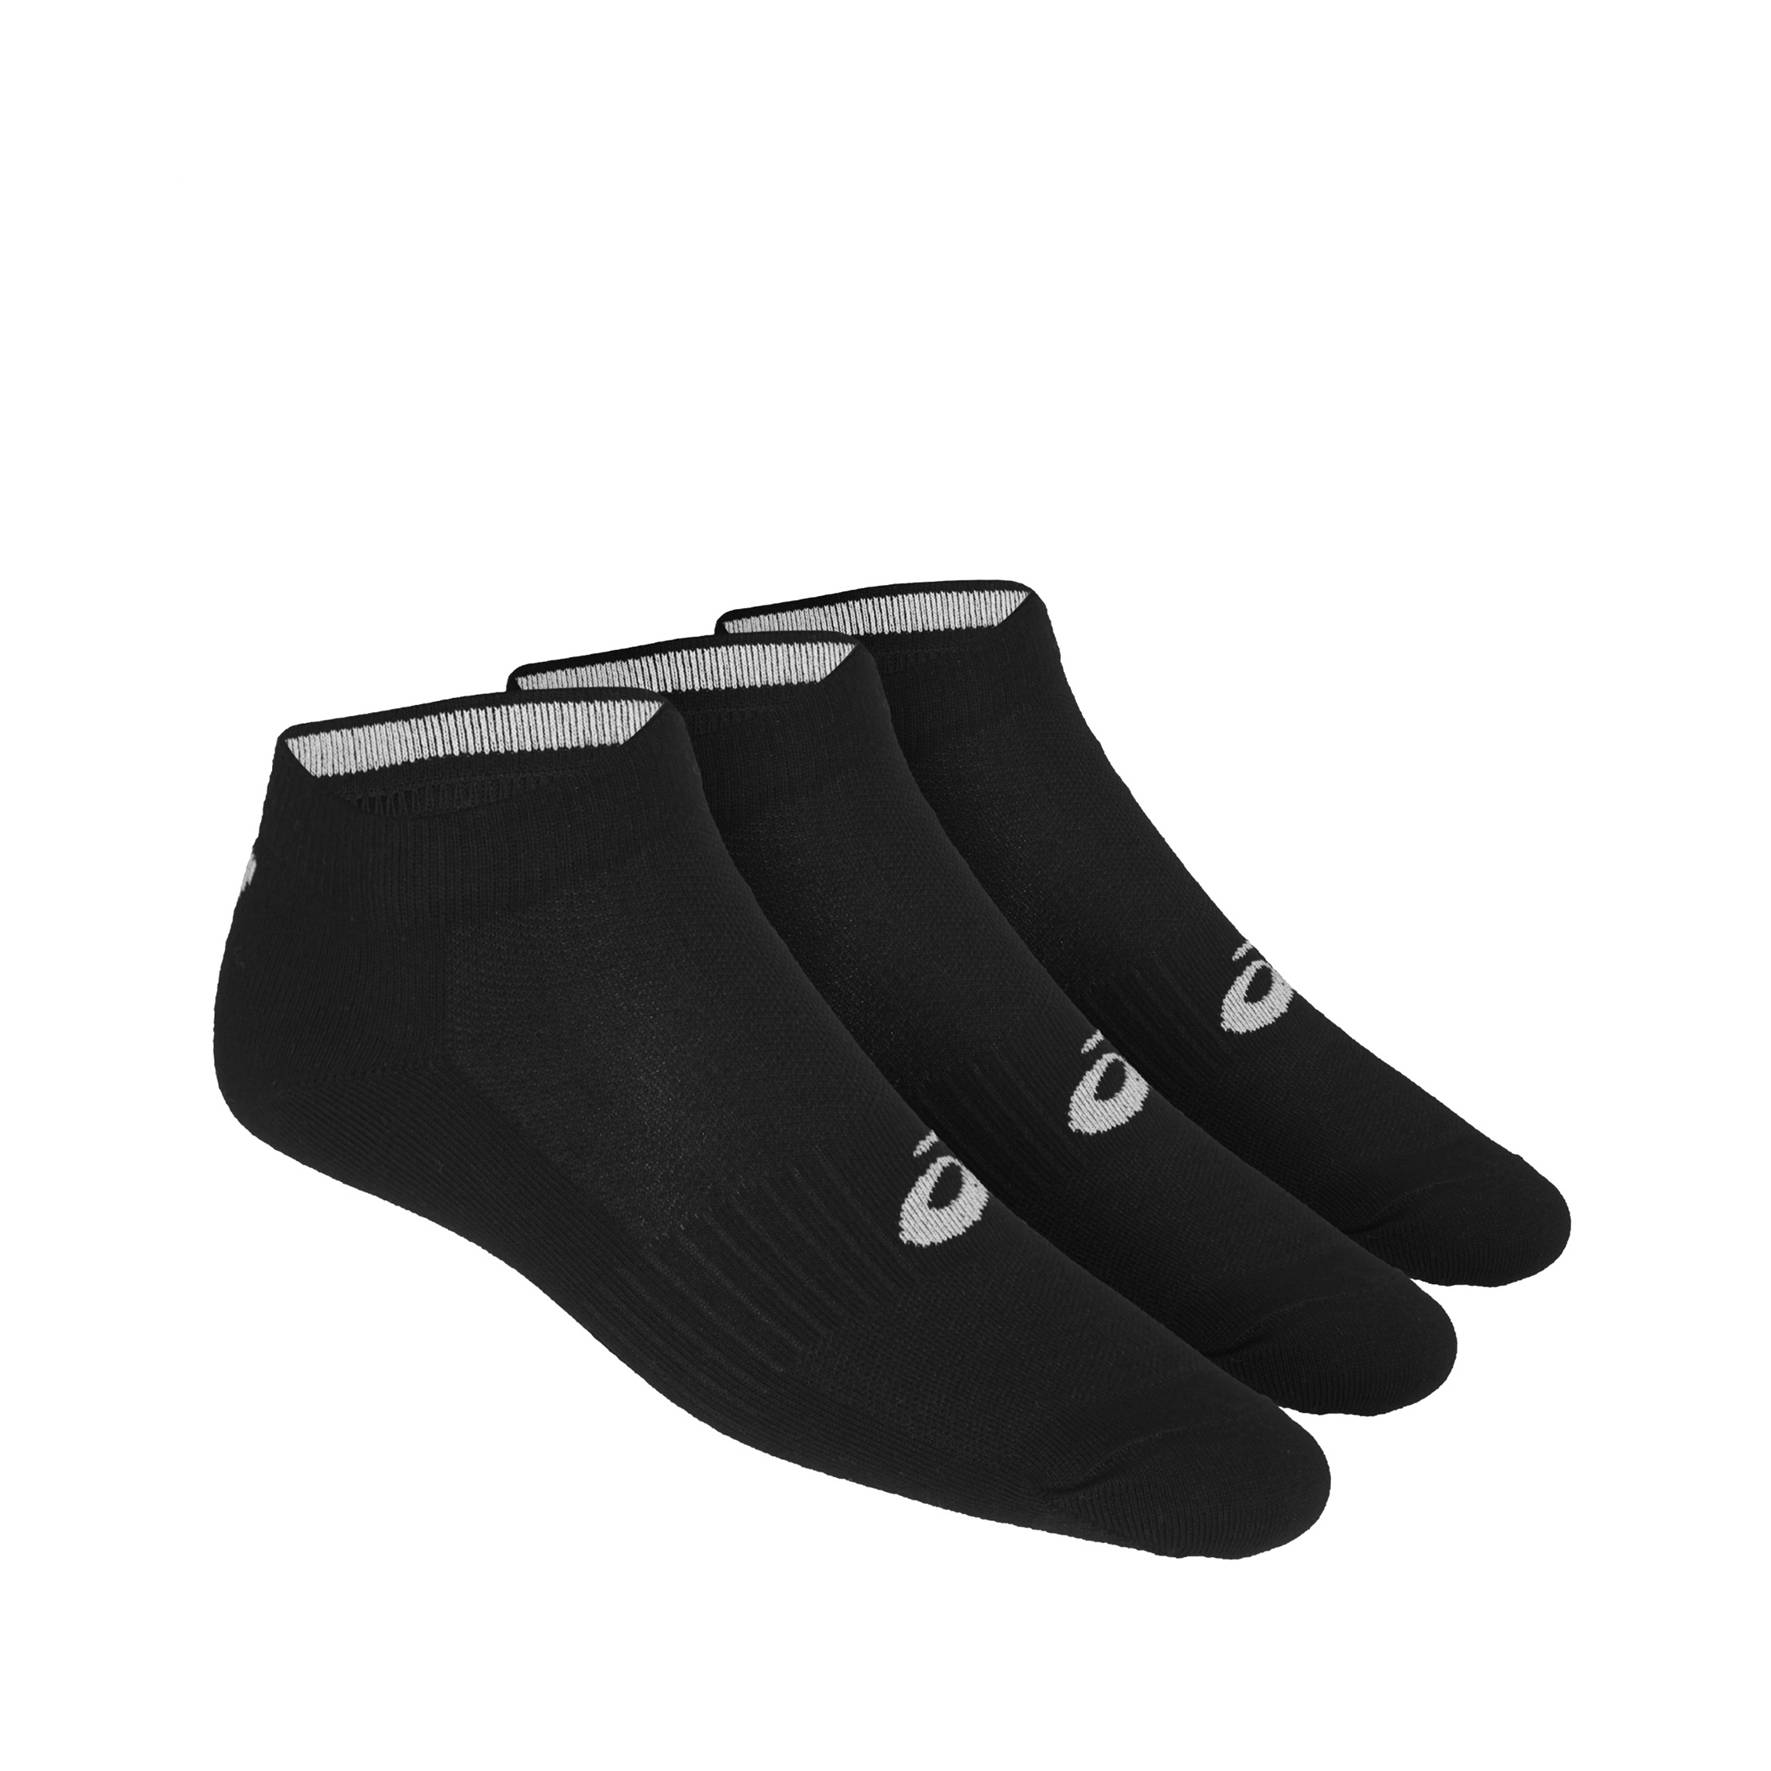 Asics Socks No Show Black x3 47-50